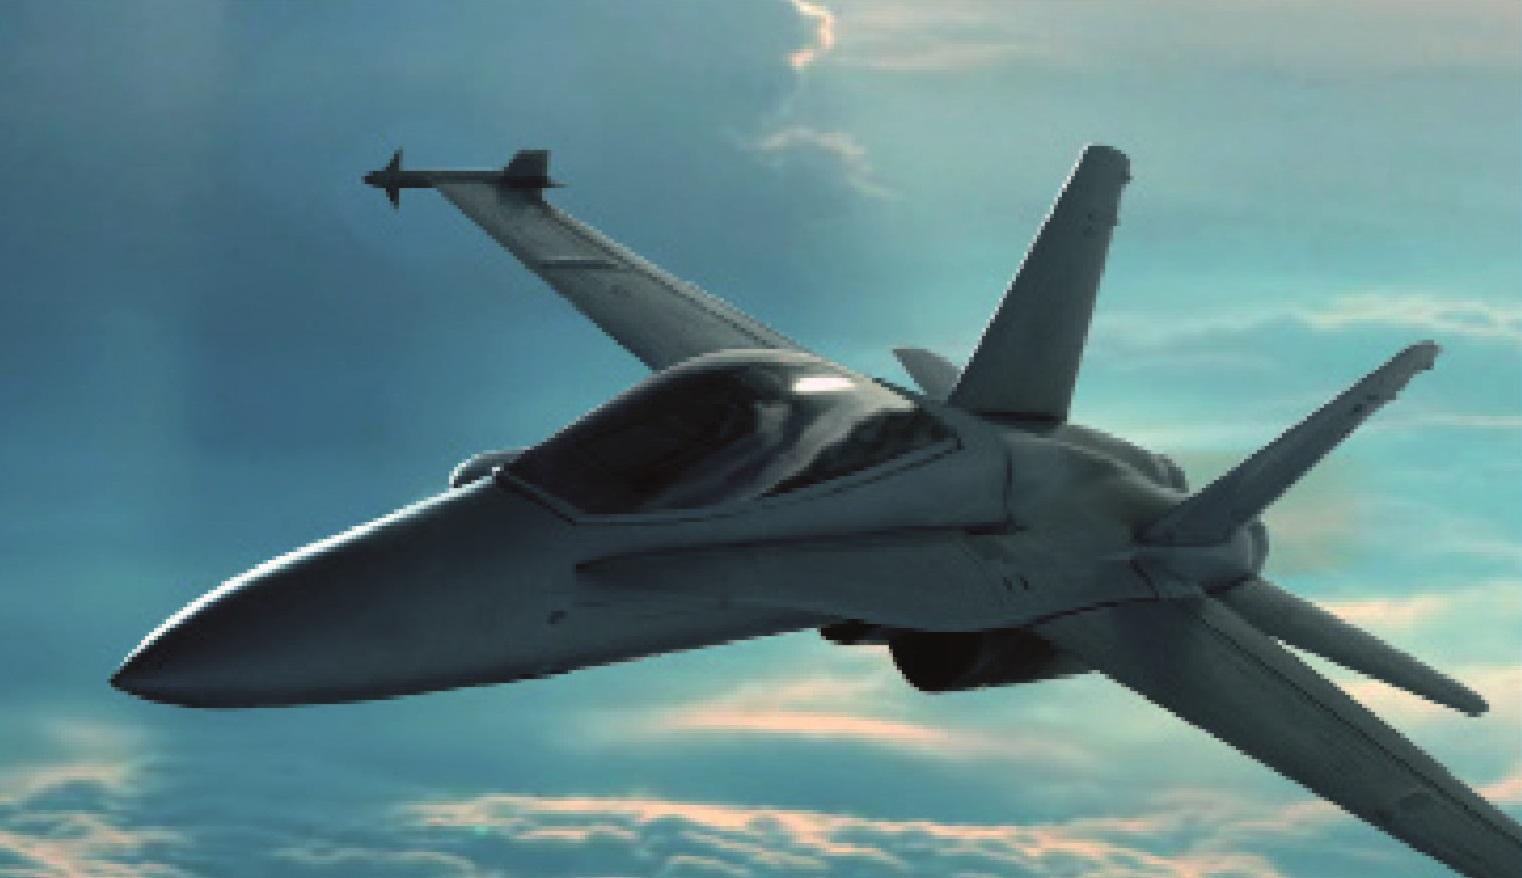 52ee1ba2a1a Aerospace CNC Machining